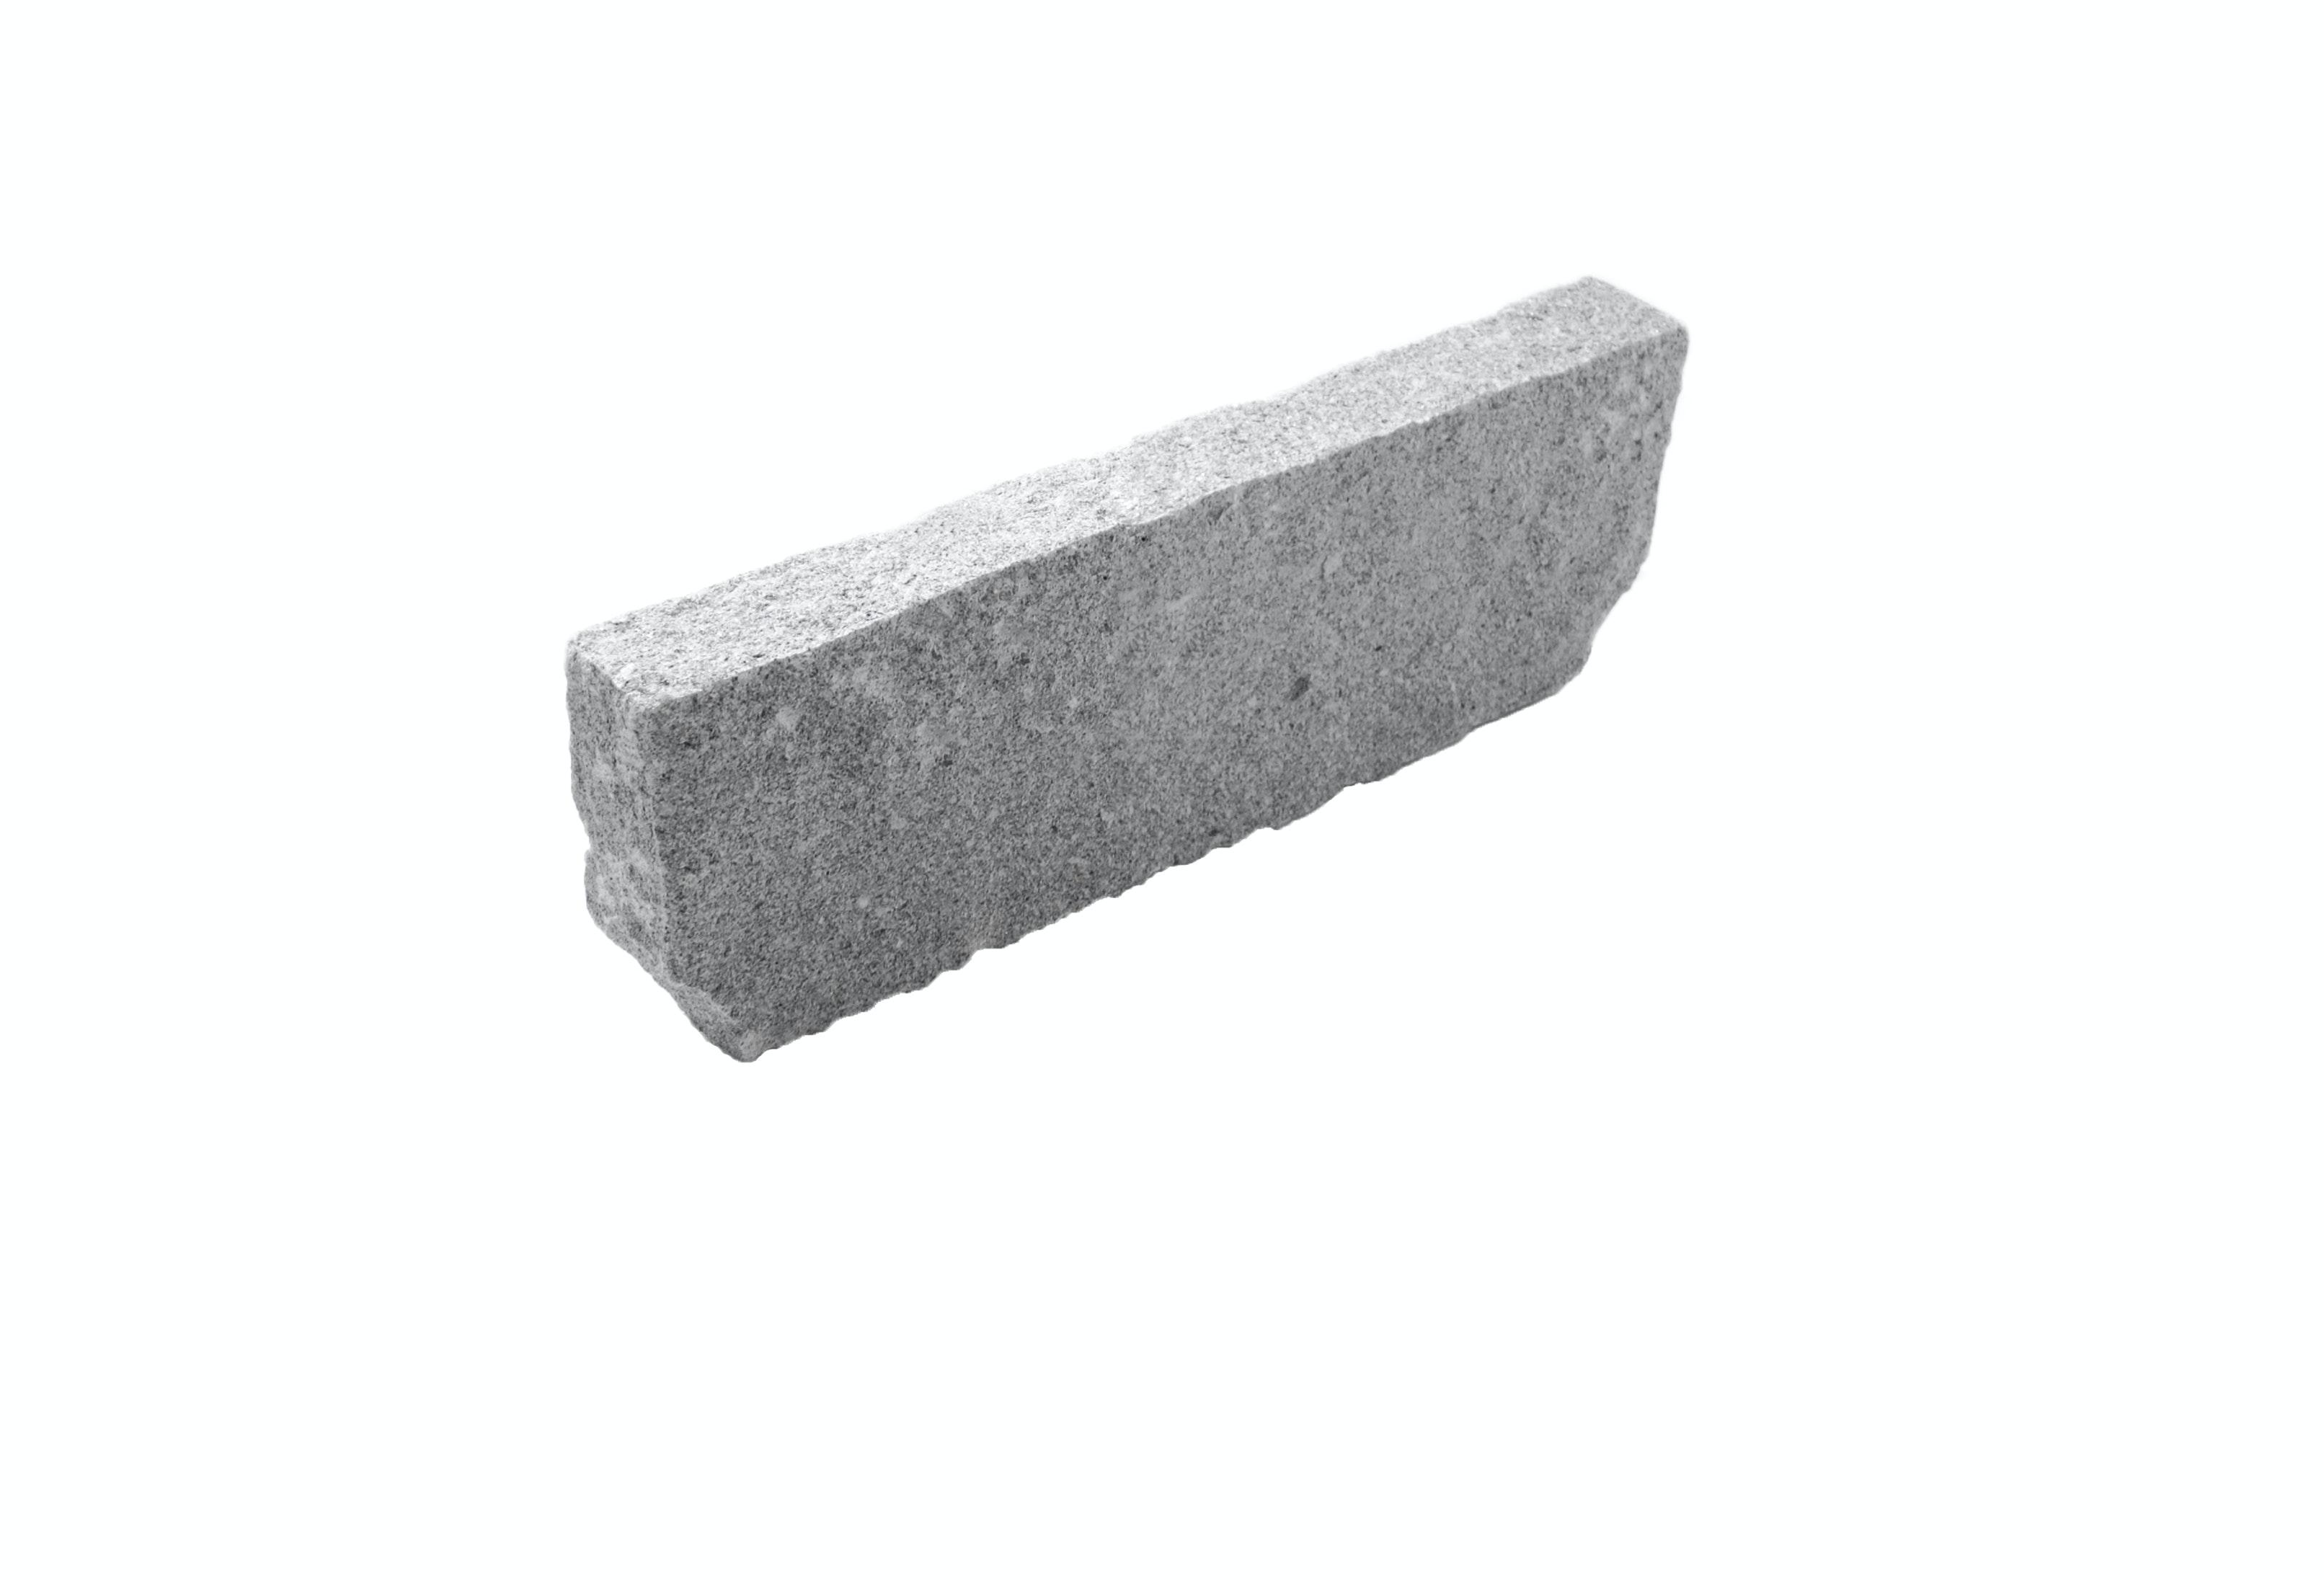 Trädgårdskantsten S:t Eriks Granit 75x200x500mm